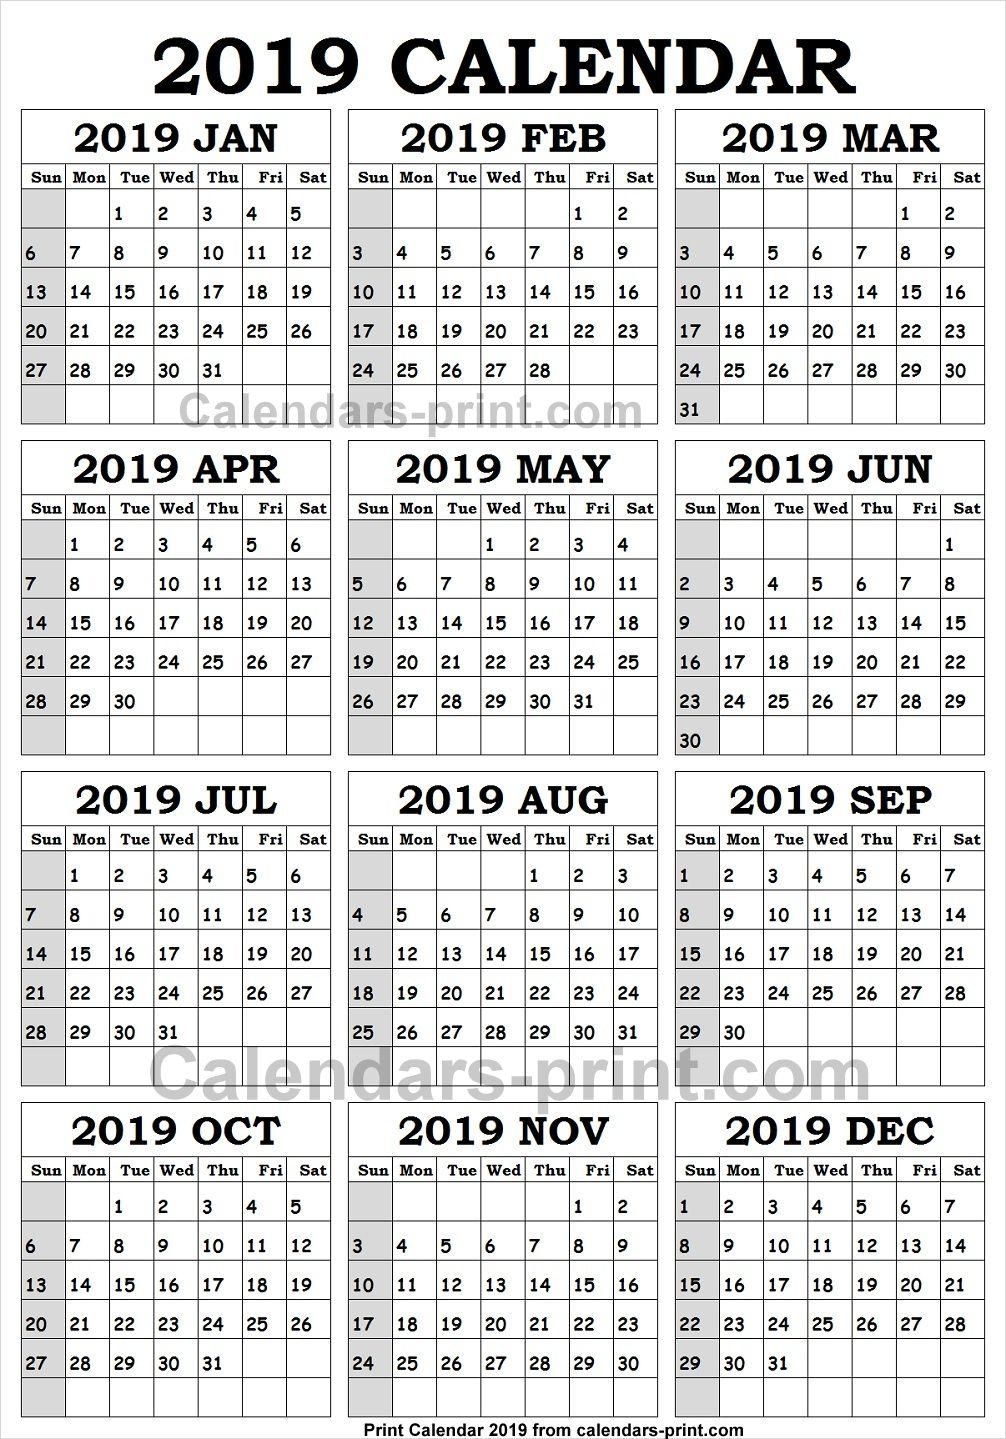 2019 Calendar Jpeg Yearly Calendar Template Calendar